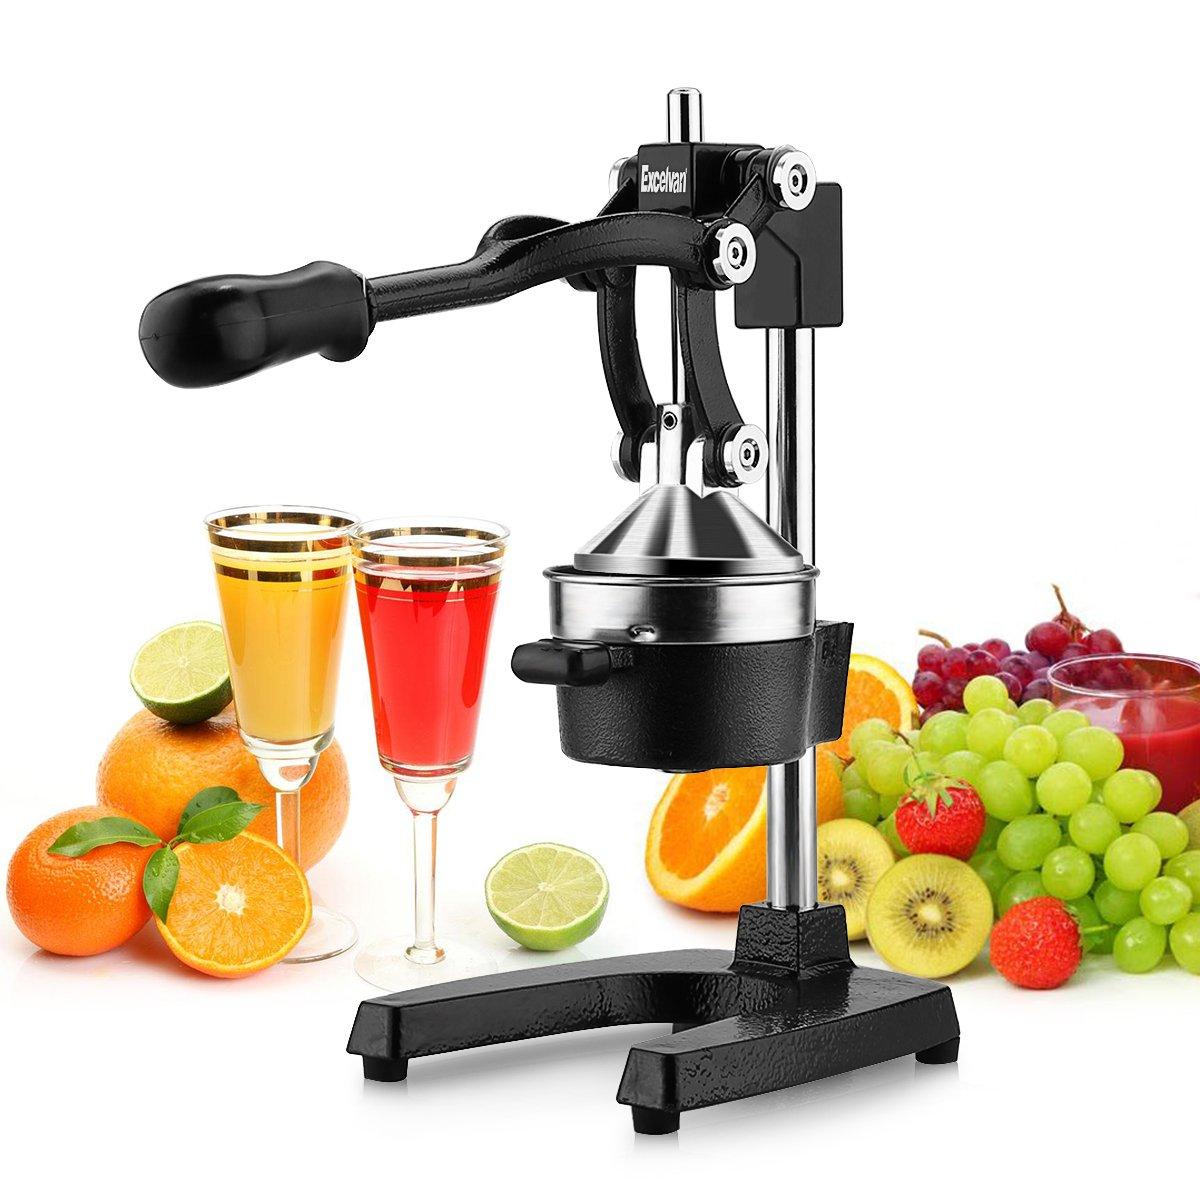 Excelvan Manual Juicer Hand Press Fresh Fruit Squeezer Commercial Pro Orange Citrus Juicer